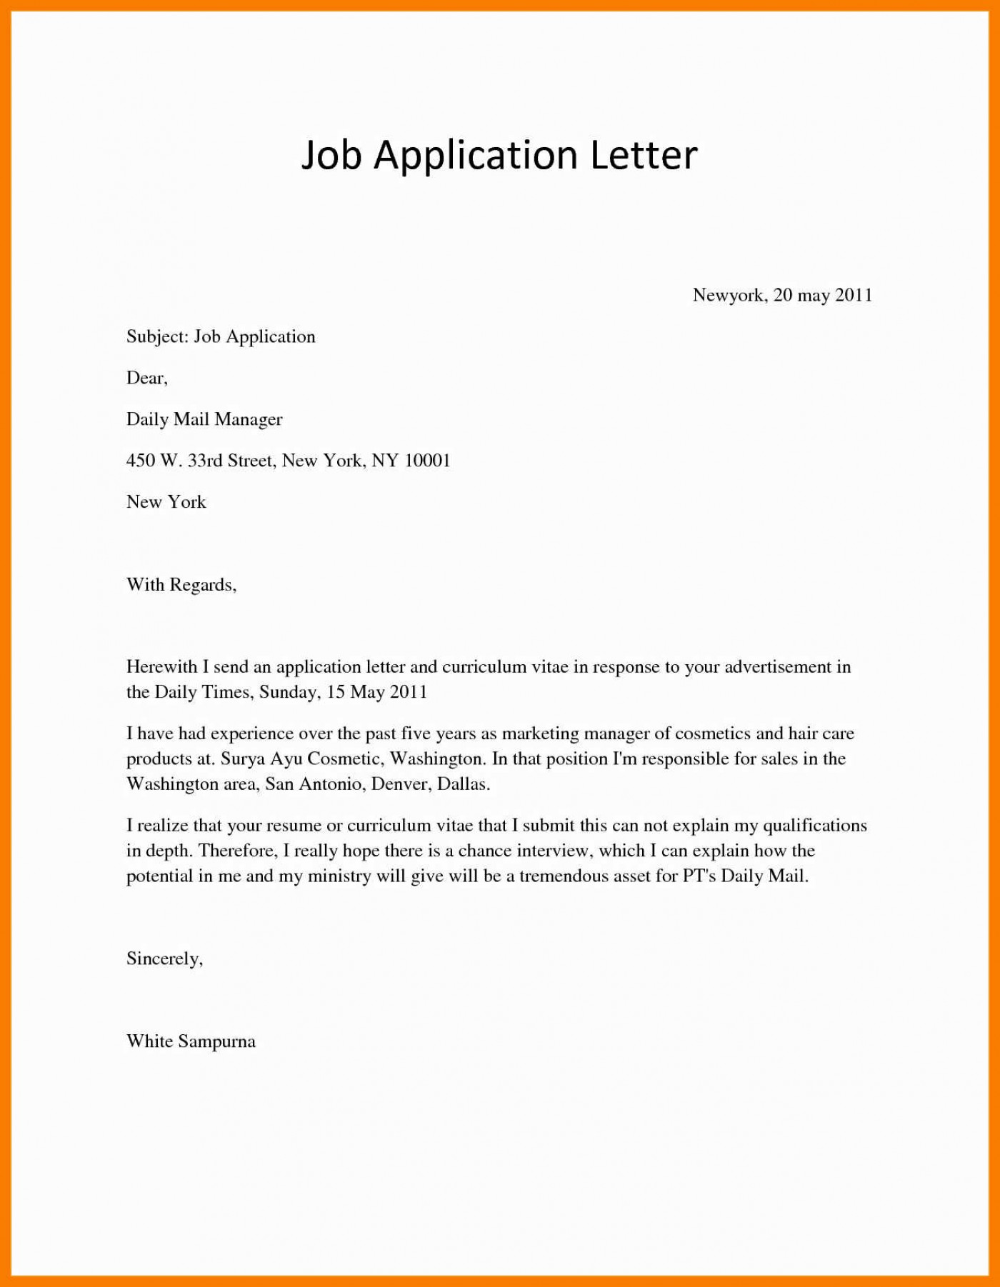 011 Email Covering Letter For Job Application Sample